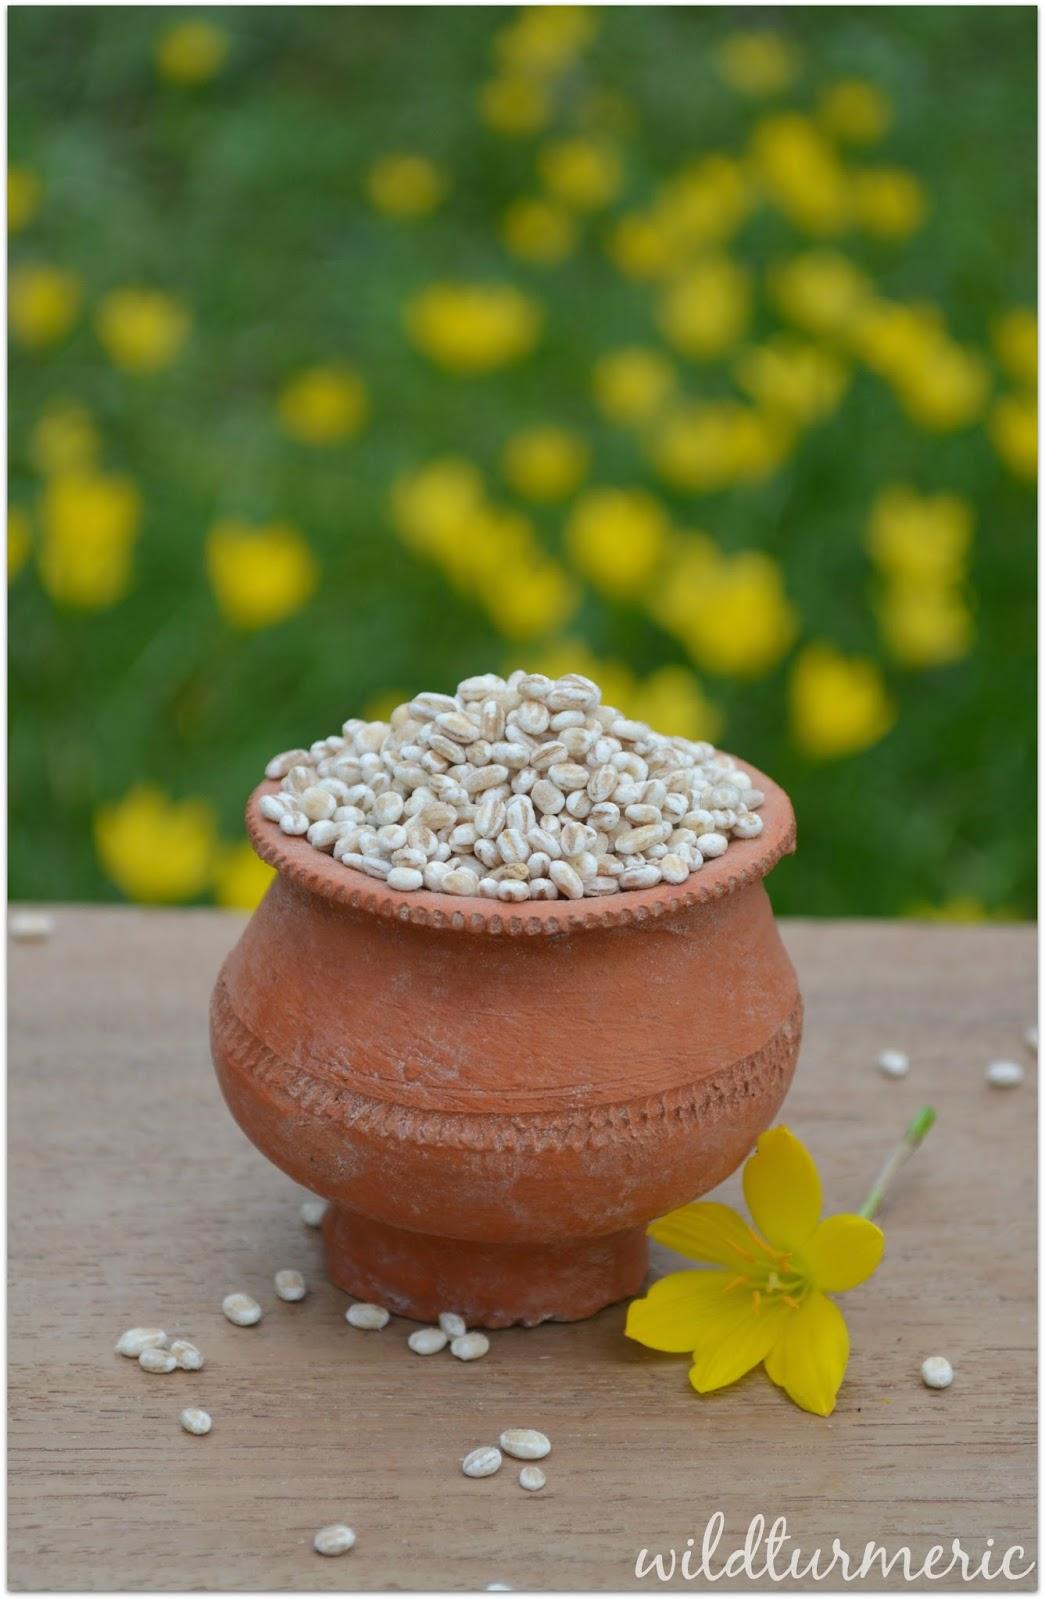 7 Top Health Benefits Of Barley | Jau For Weight Loss, Diabetes, Skin & Hair